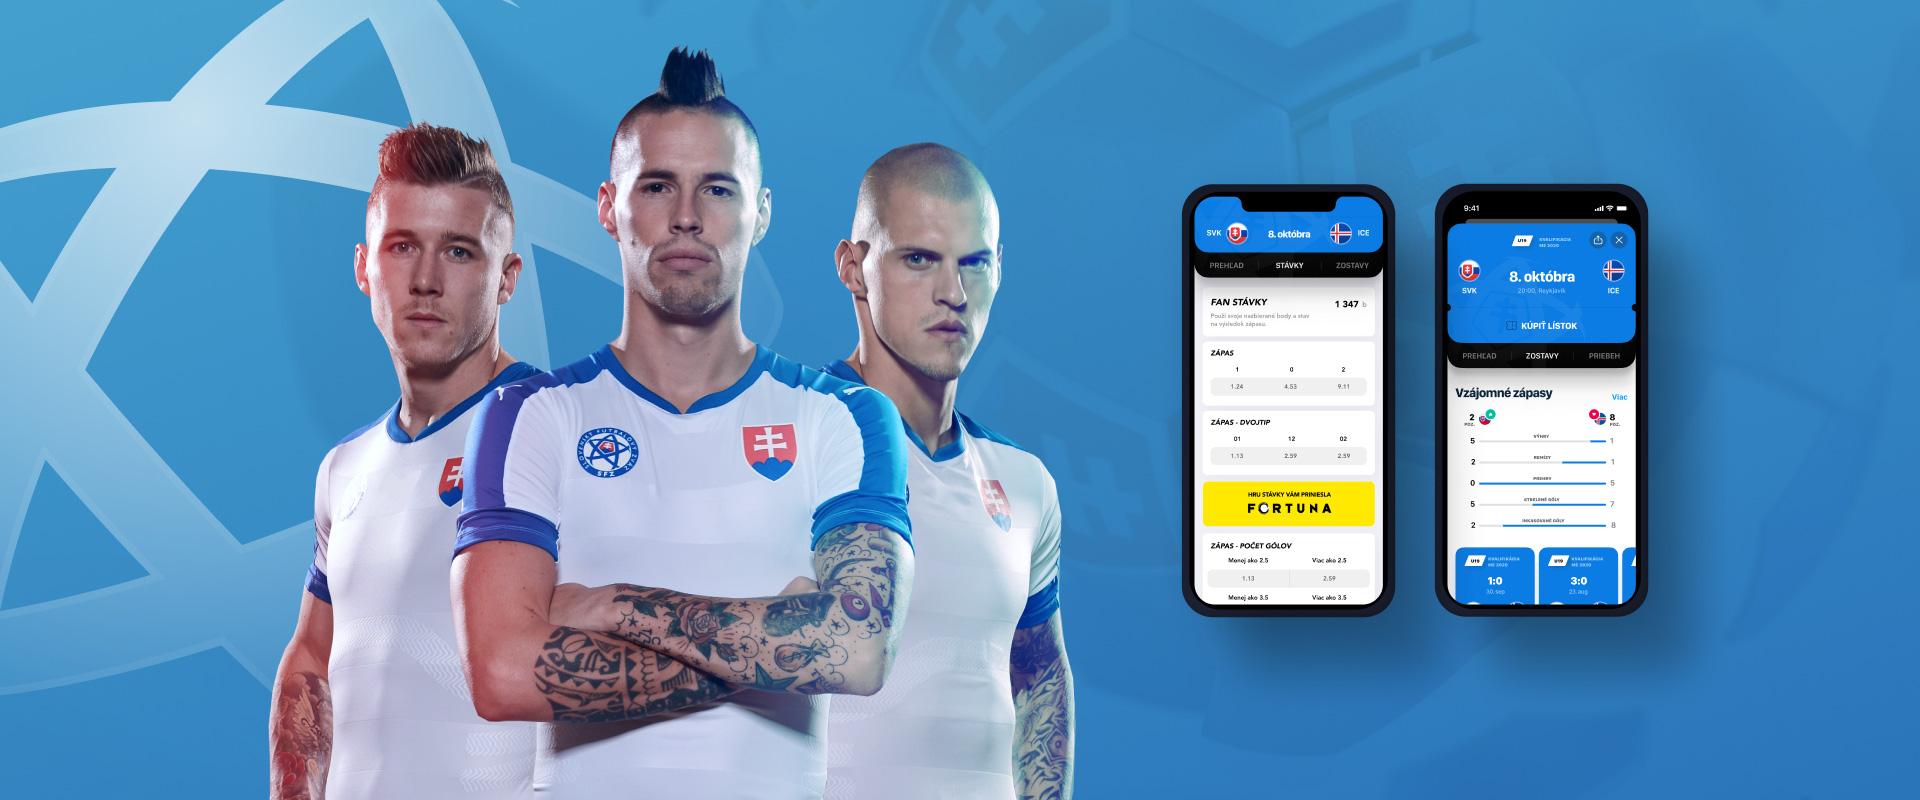 #grpartners: Get closer to Slovak football thanks to REPREzóna app